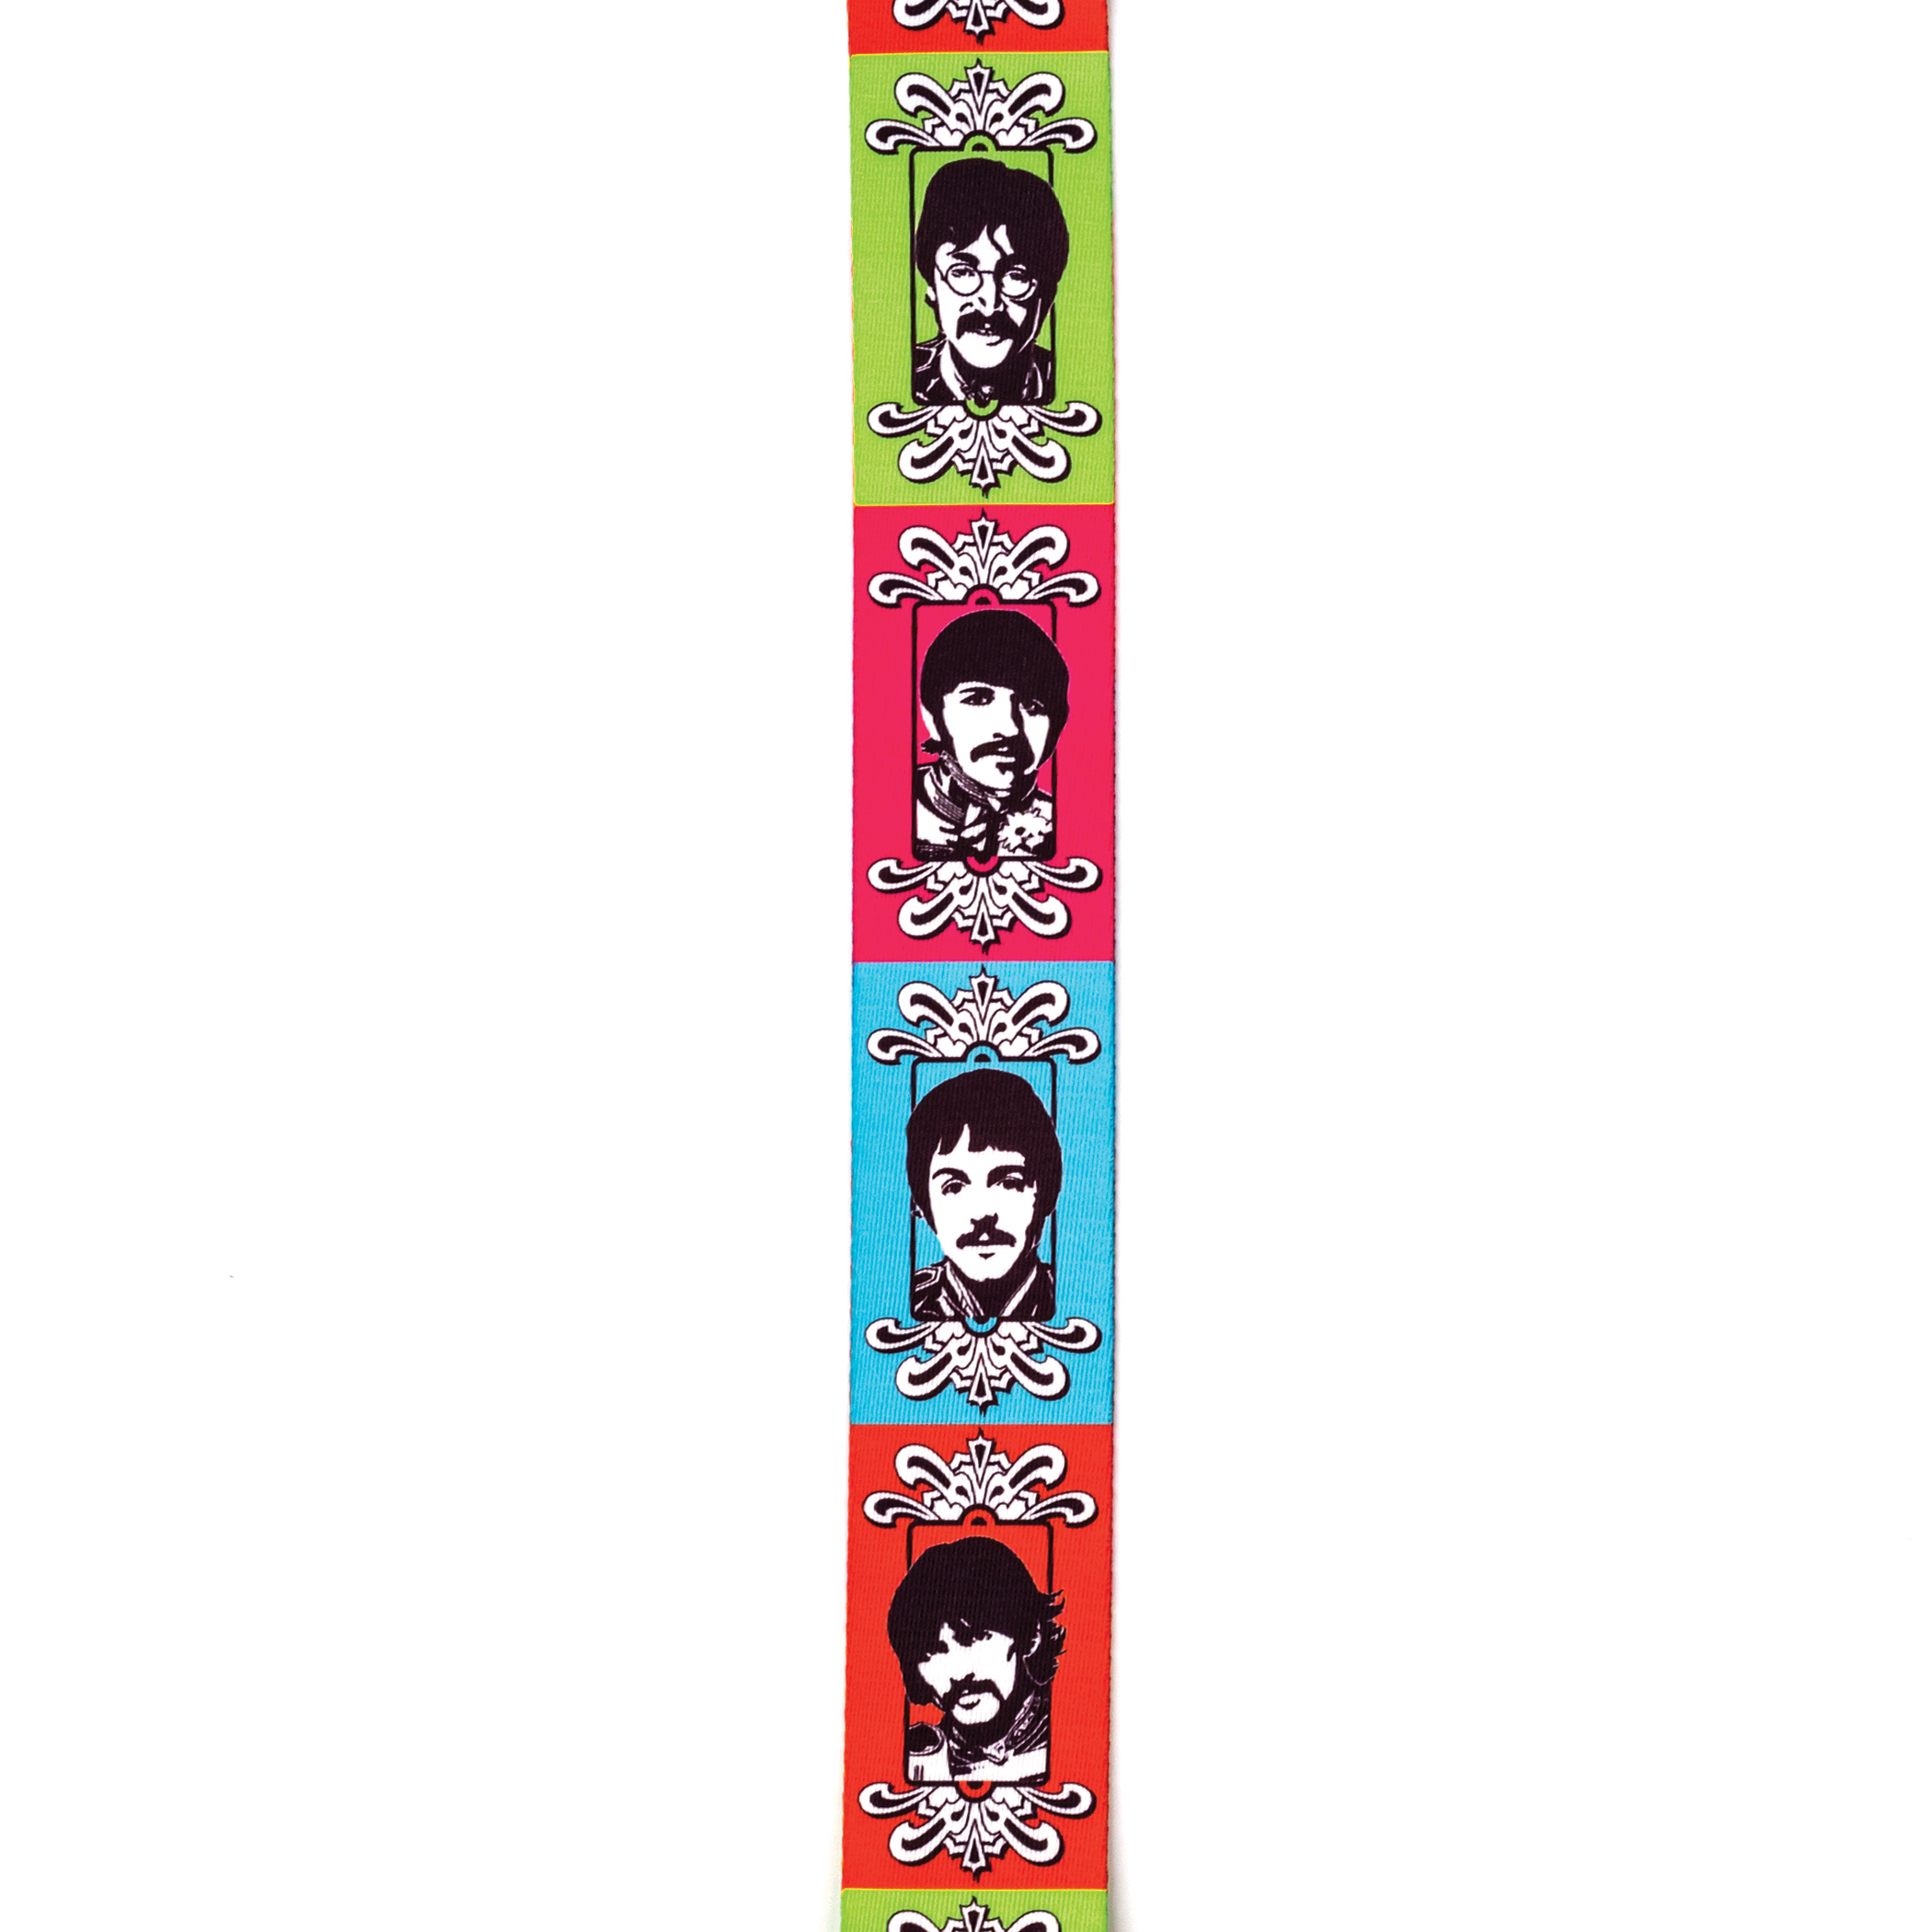 Beatles-sgt peppers LHCB guitar strap